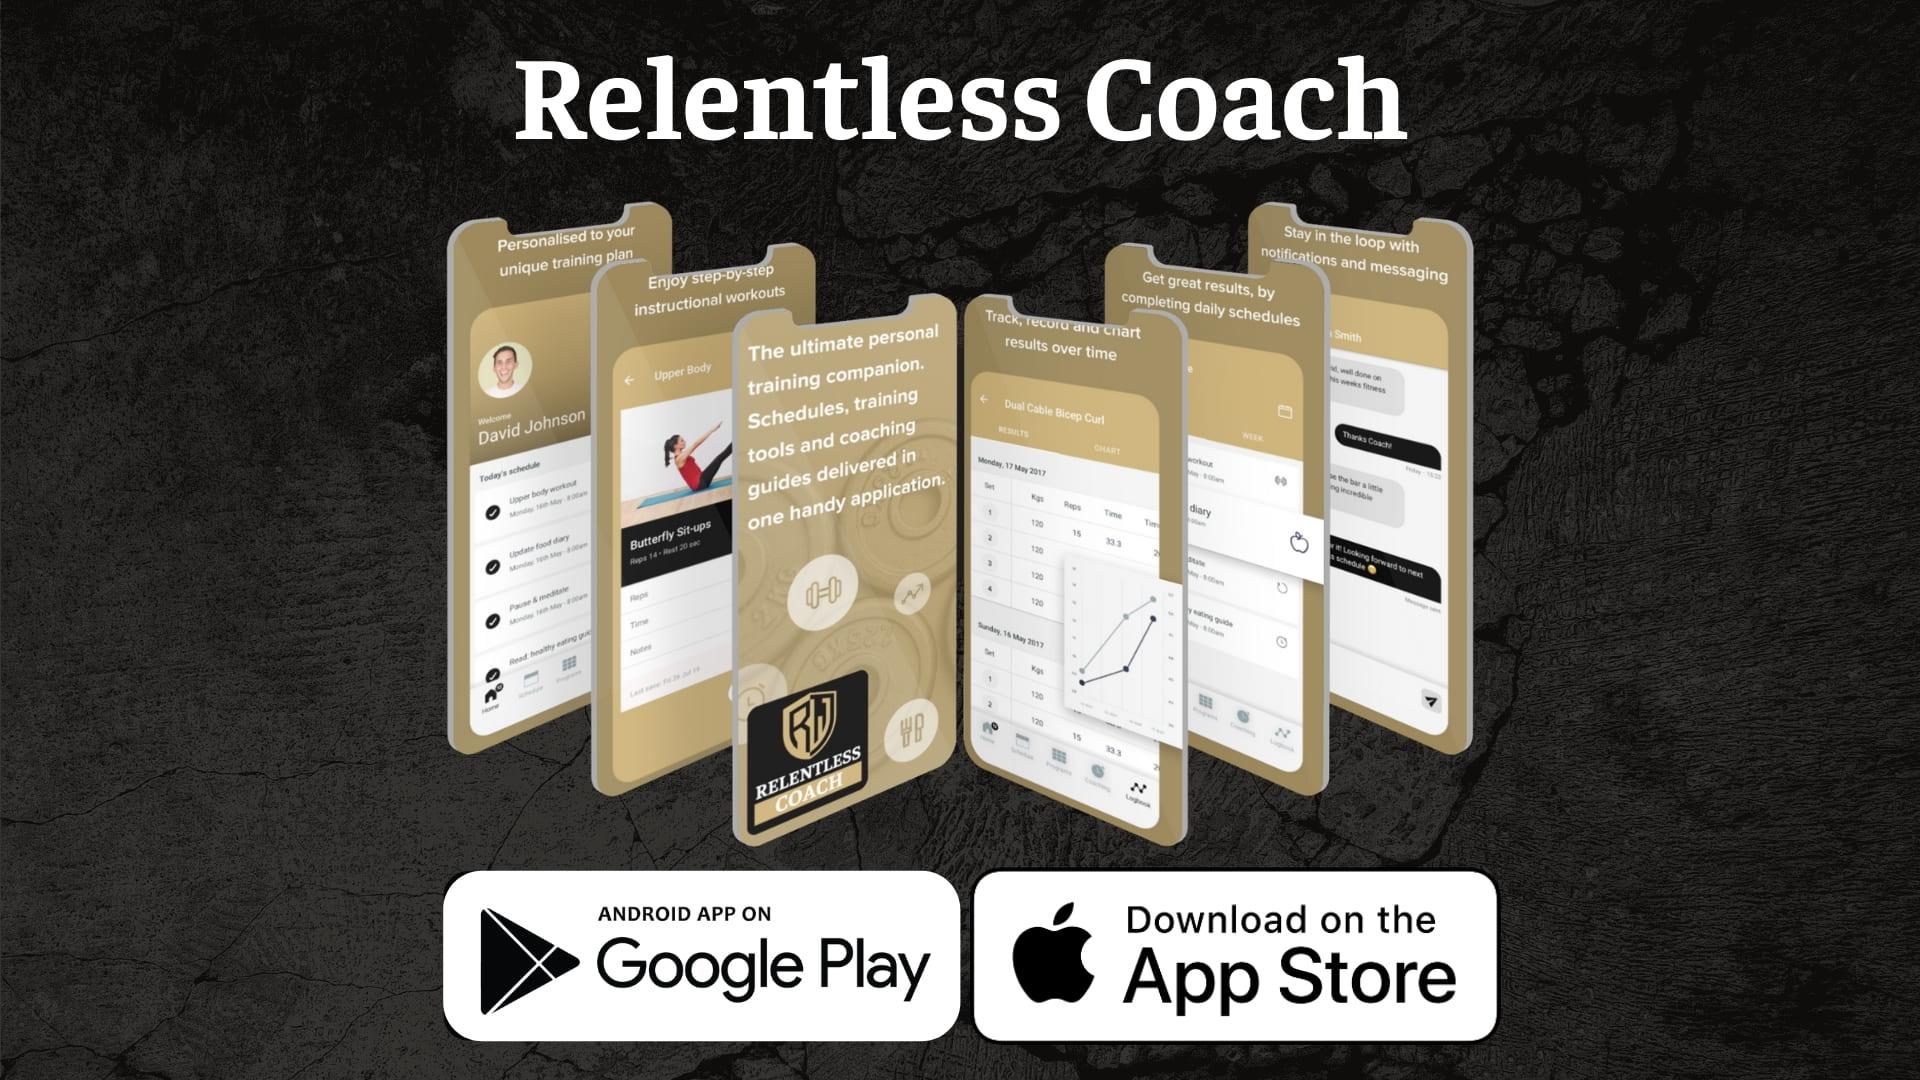 Relentless Coach App